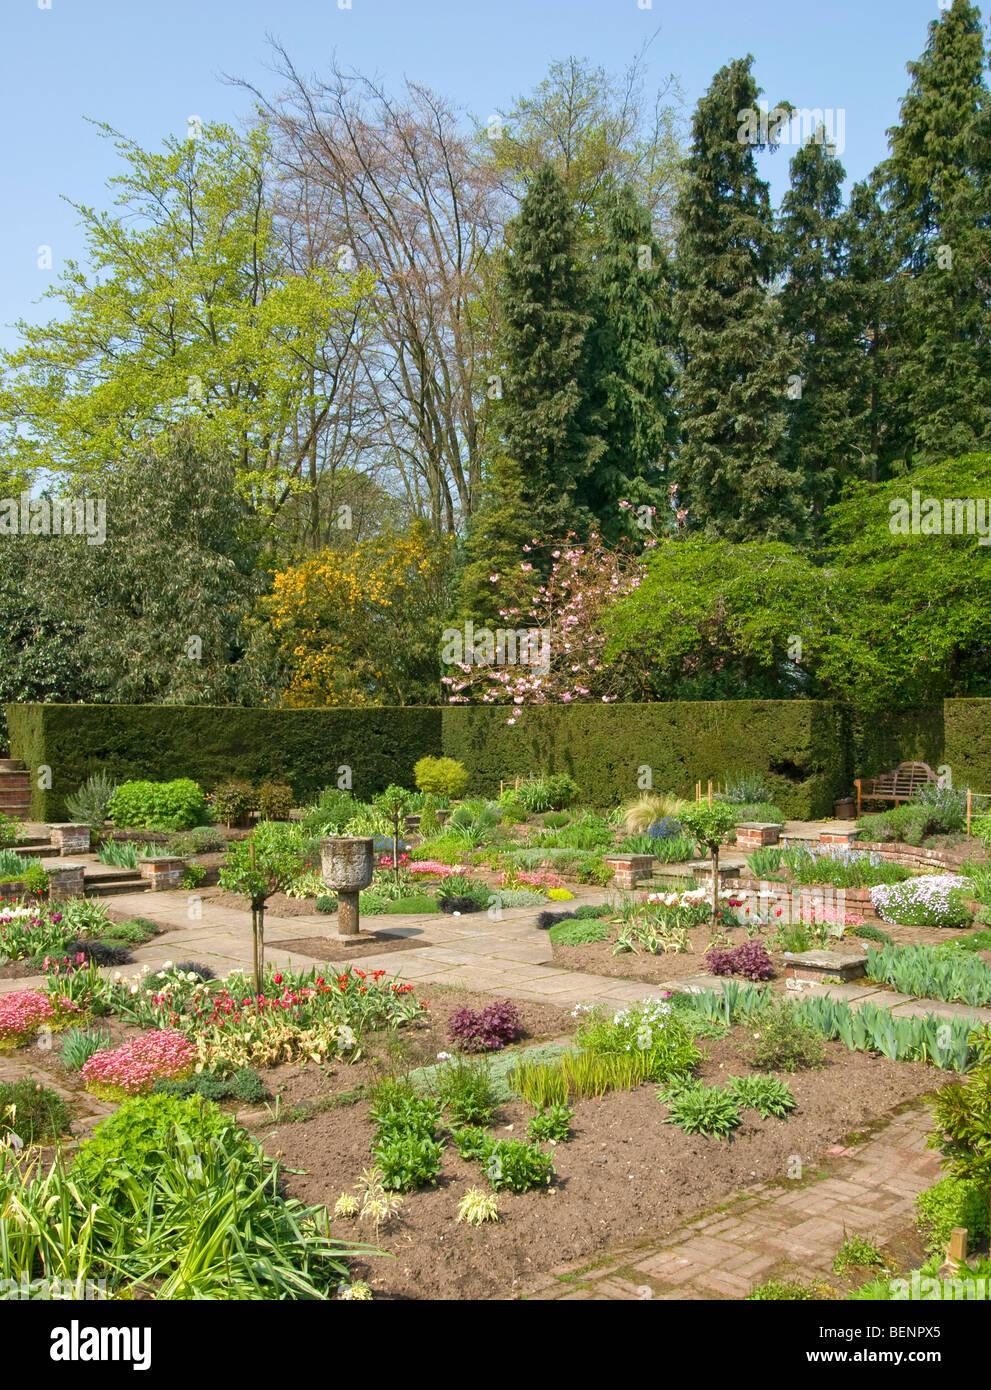 formal garden in spring urn tulips paths heuchera iris saxifrage [Newby Hall] Ripon [North Yorkshire] - Stock Image